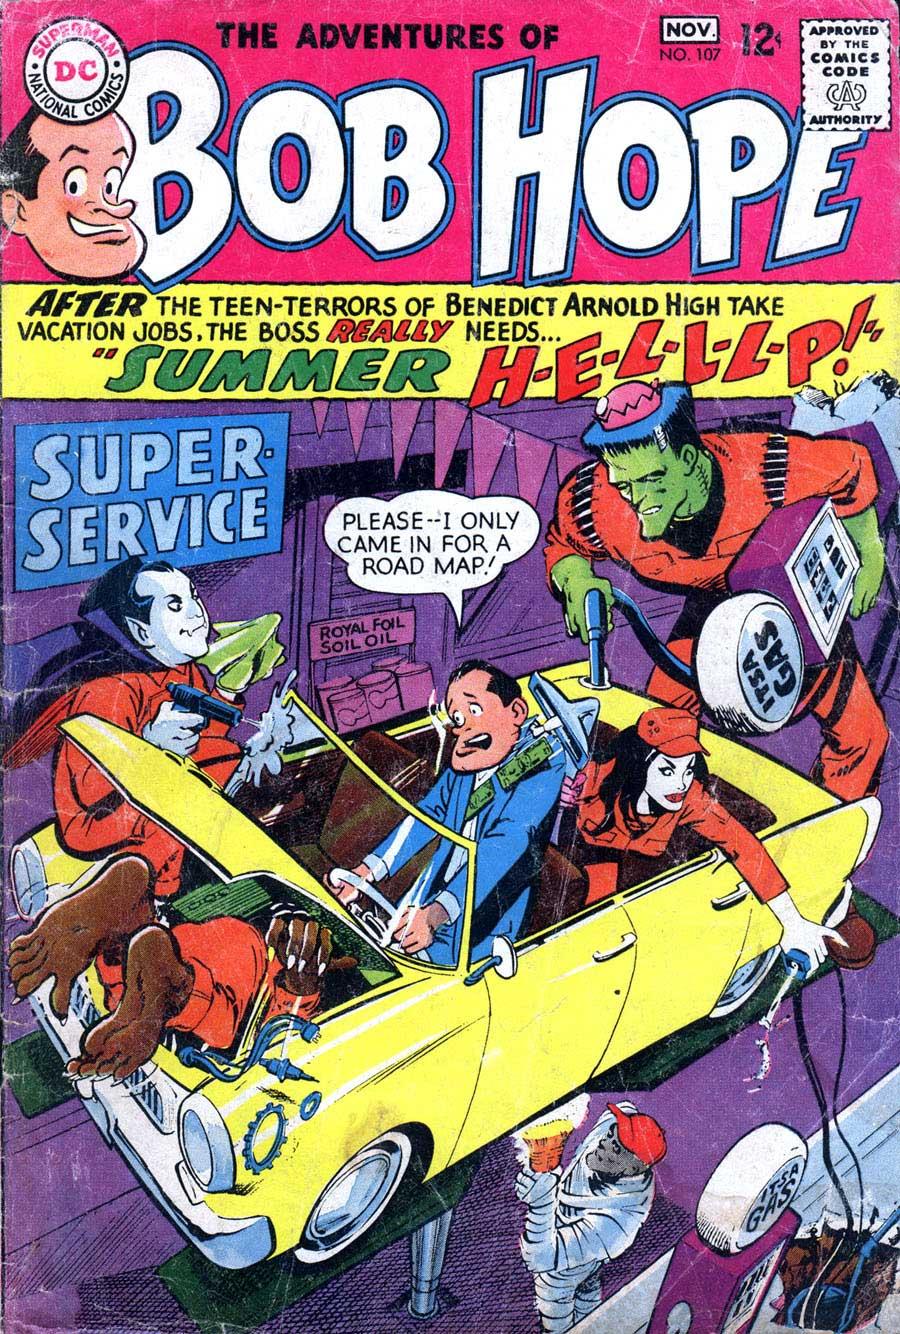 Adventures of Bob Hope v1 #107 - Neal Adams dc 1960s comic book cover art